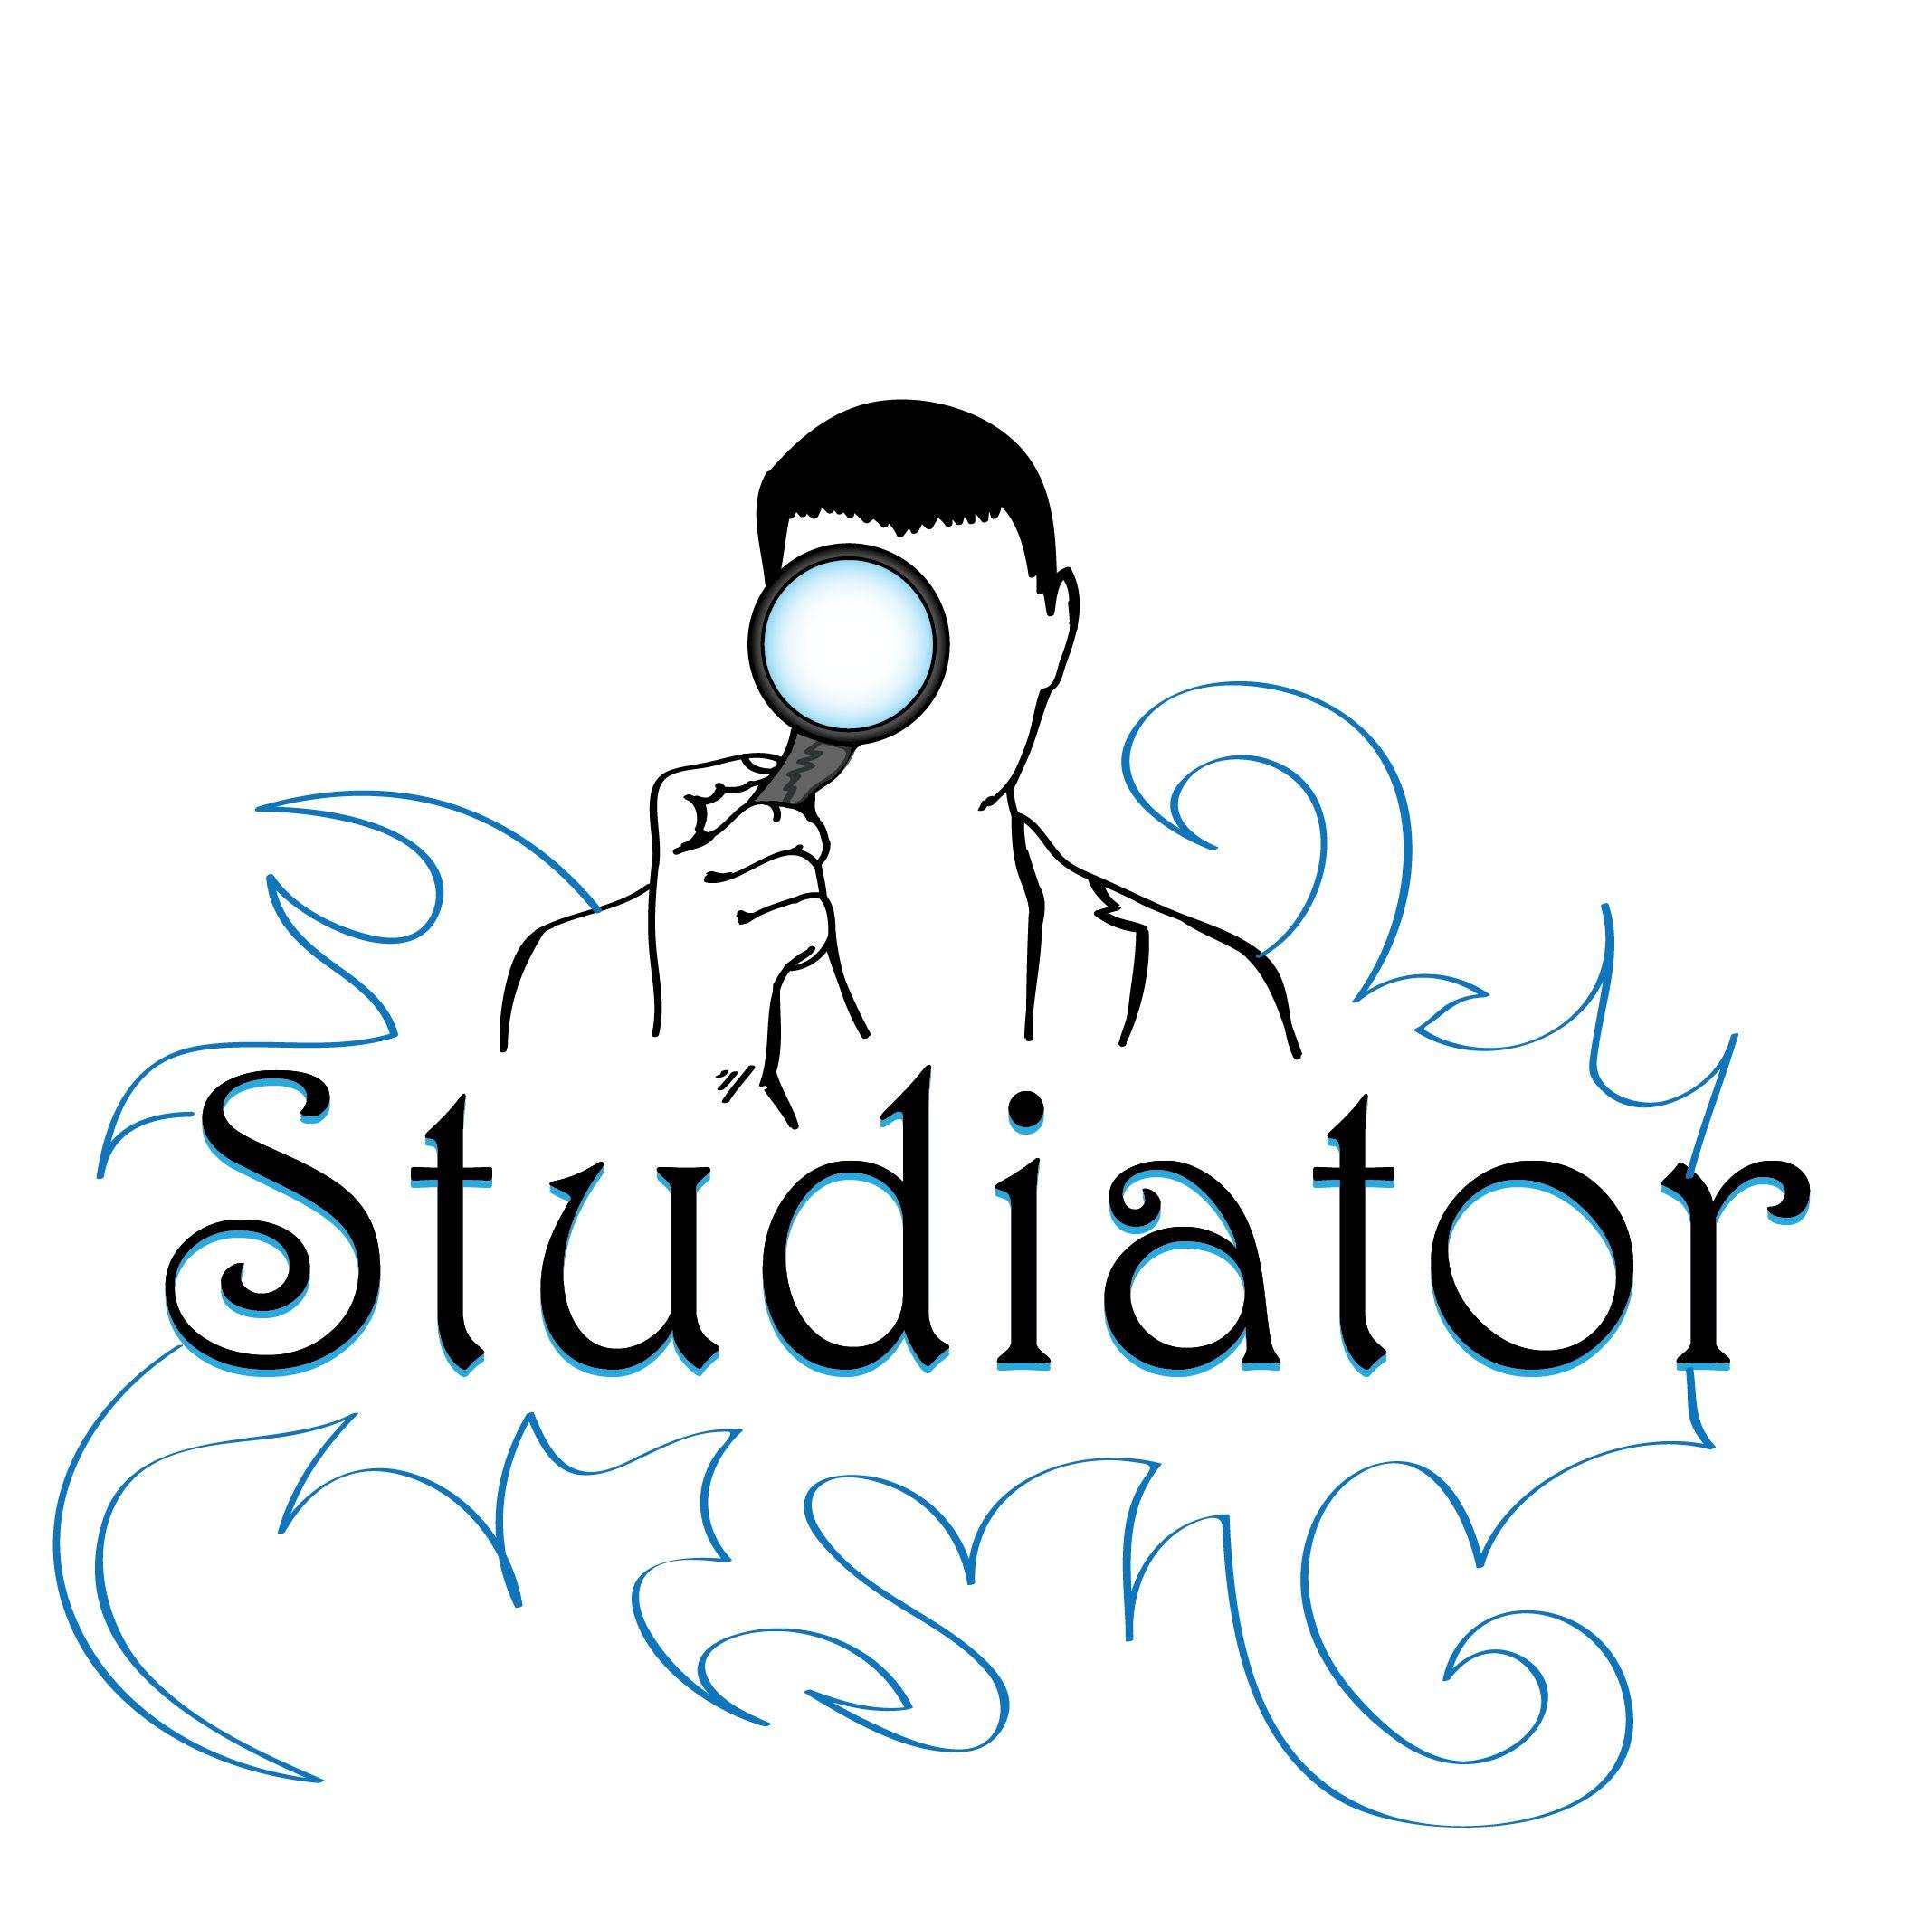 Логотип для каталога студий Веб-дизайна - дизайнер Corpline